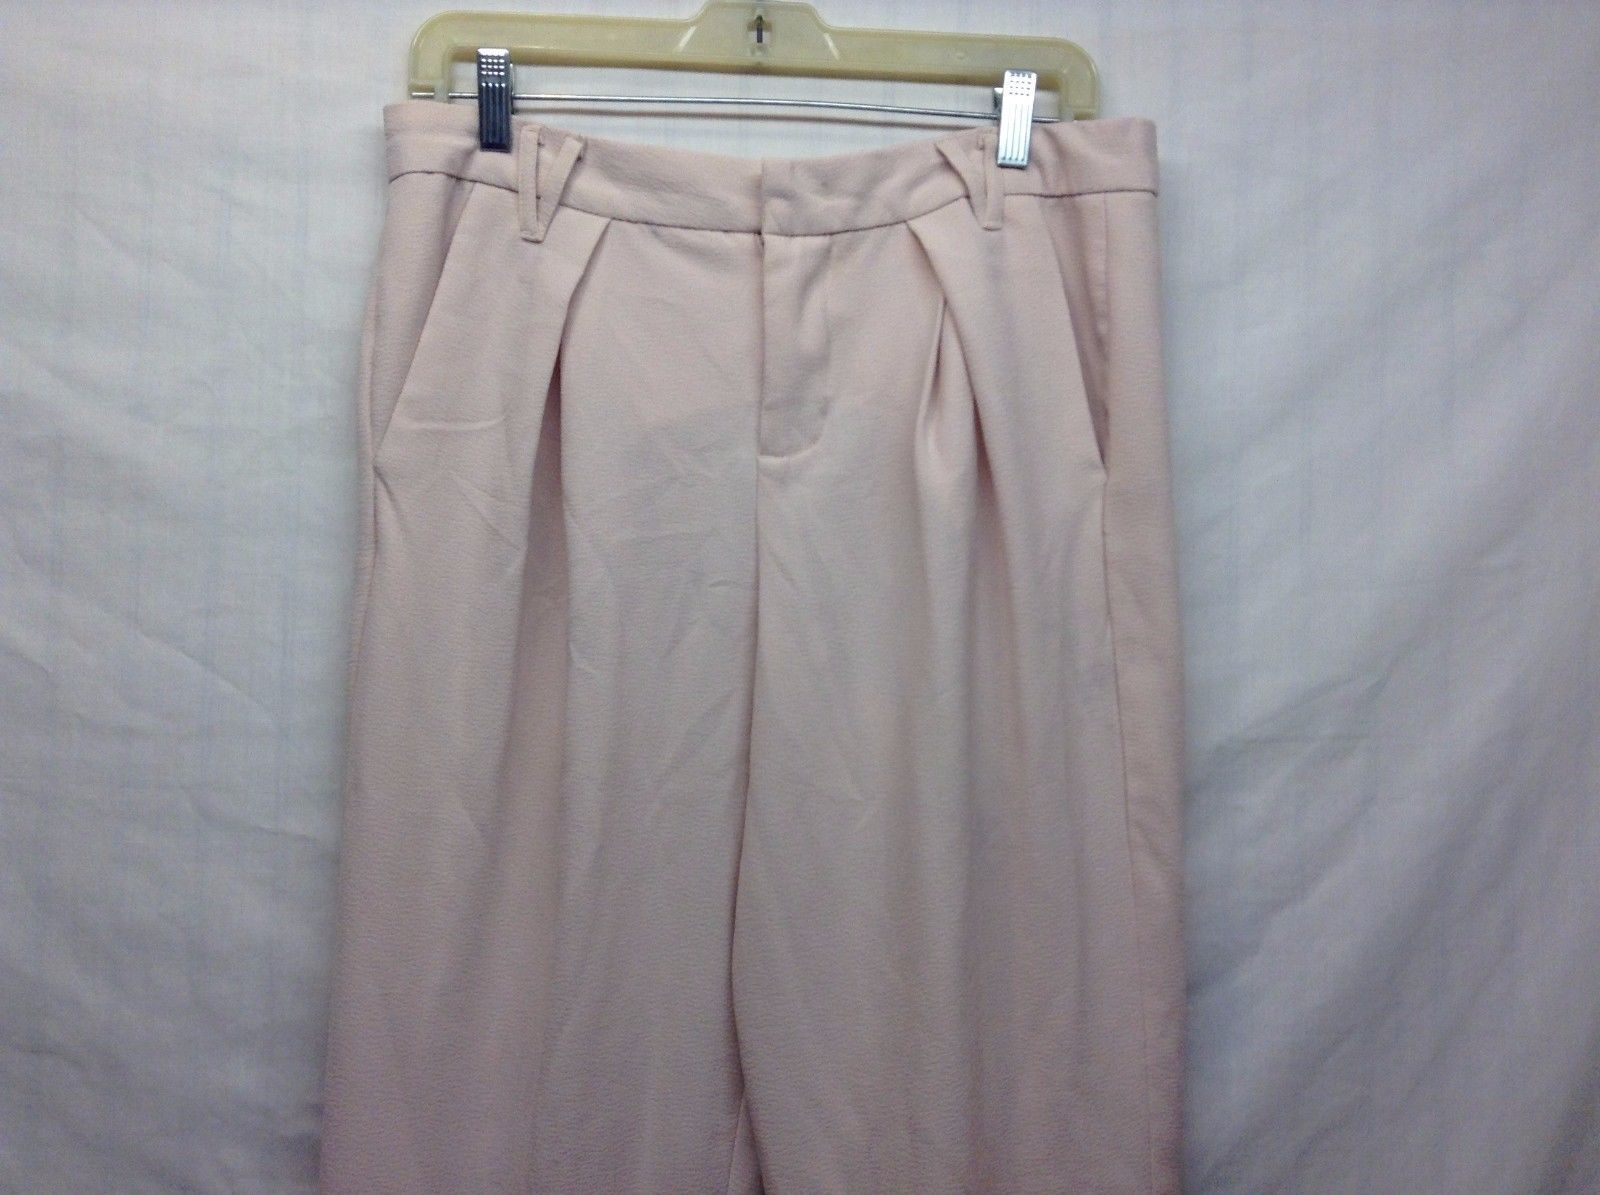 Nine West Peach Pink Pants Sz 8